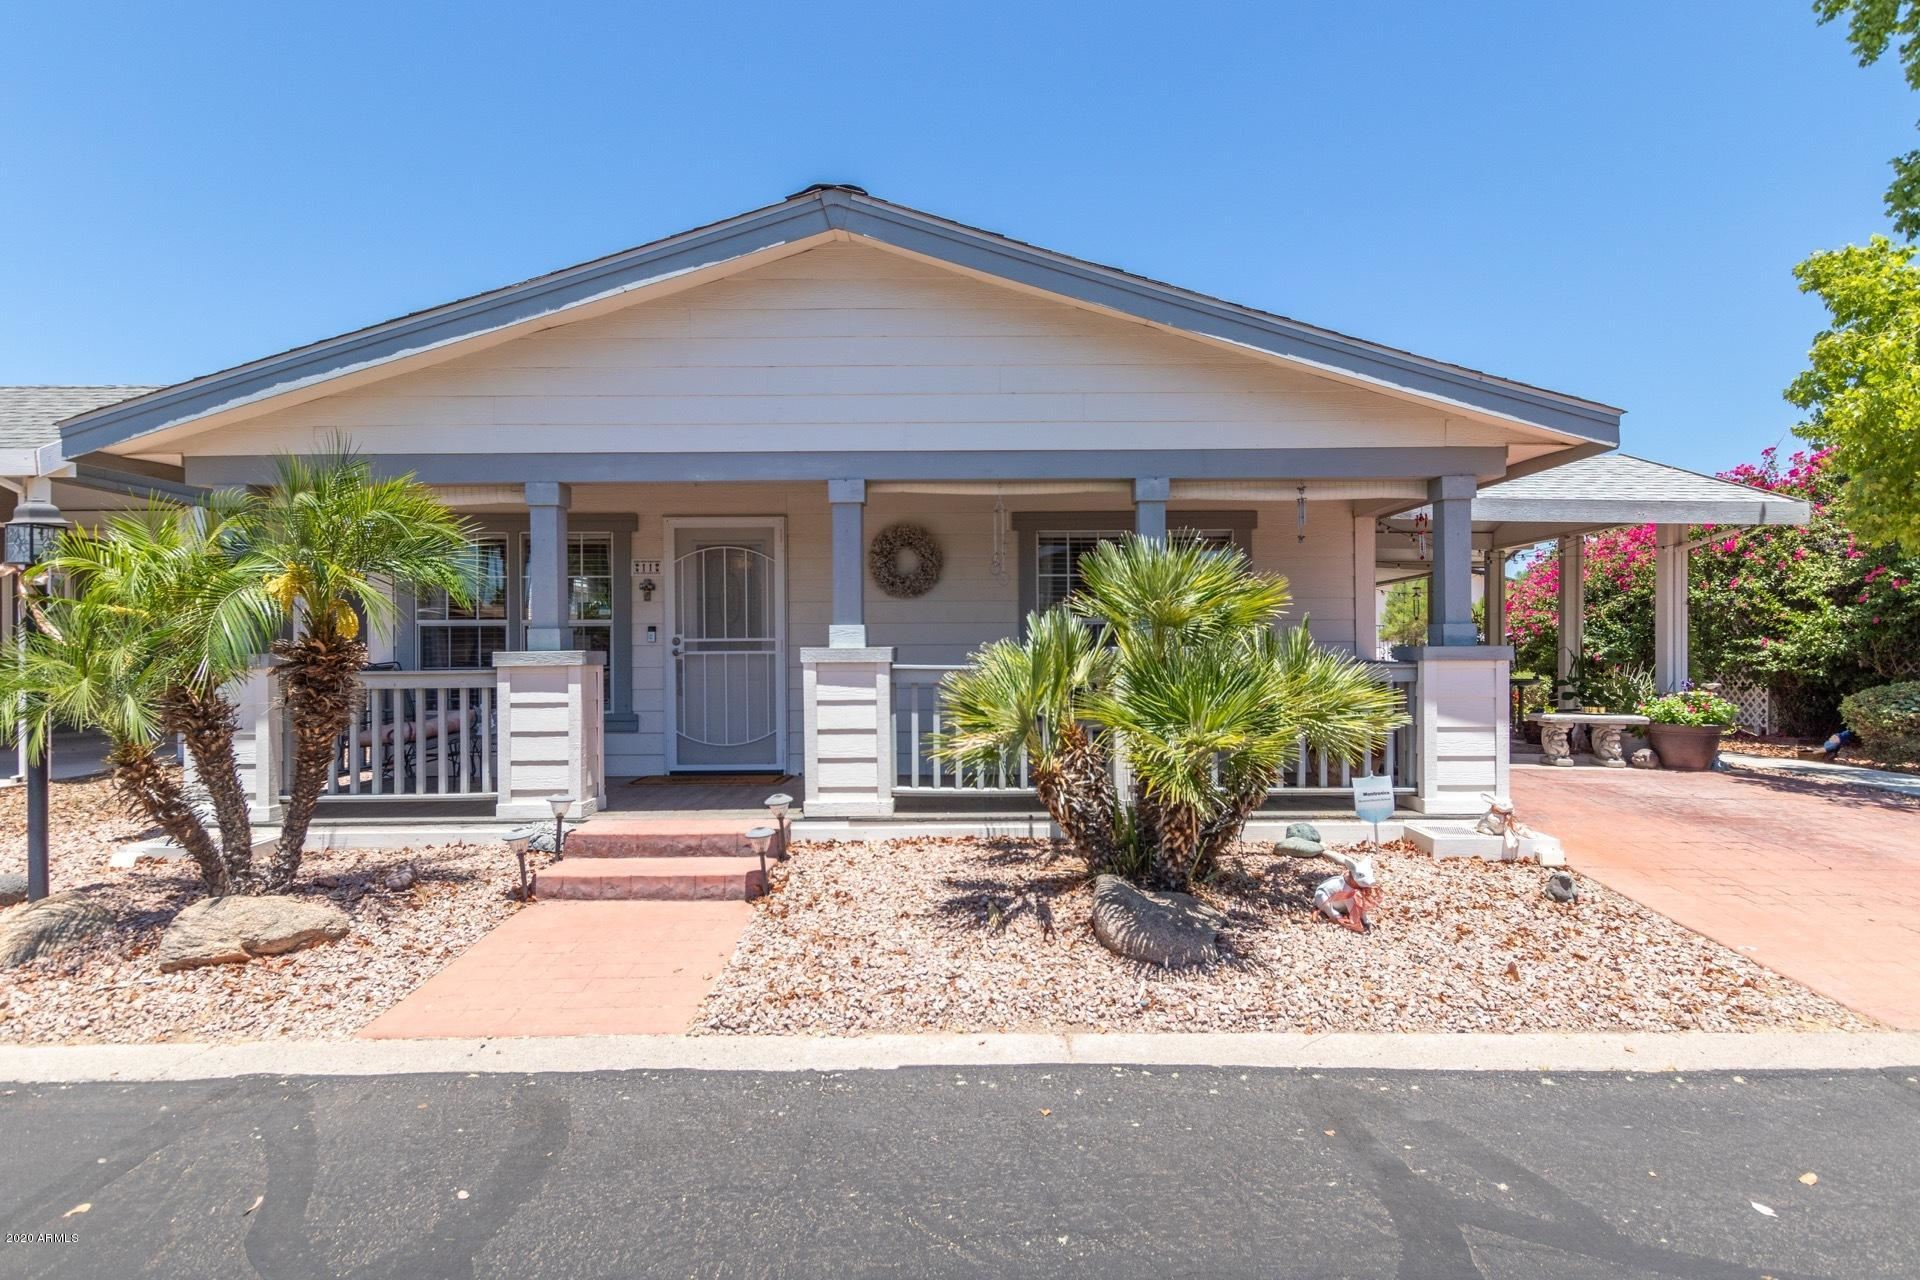 19602 N 32ND Street #11, Phoenix, AZ 85050 - MLS#: 6095543